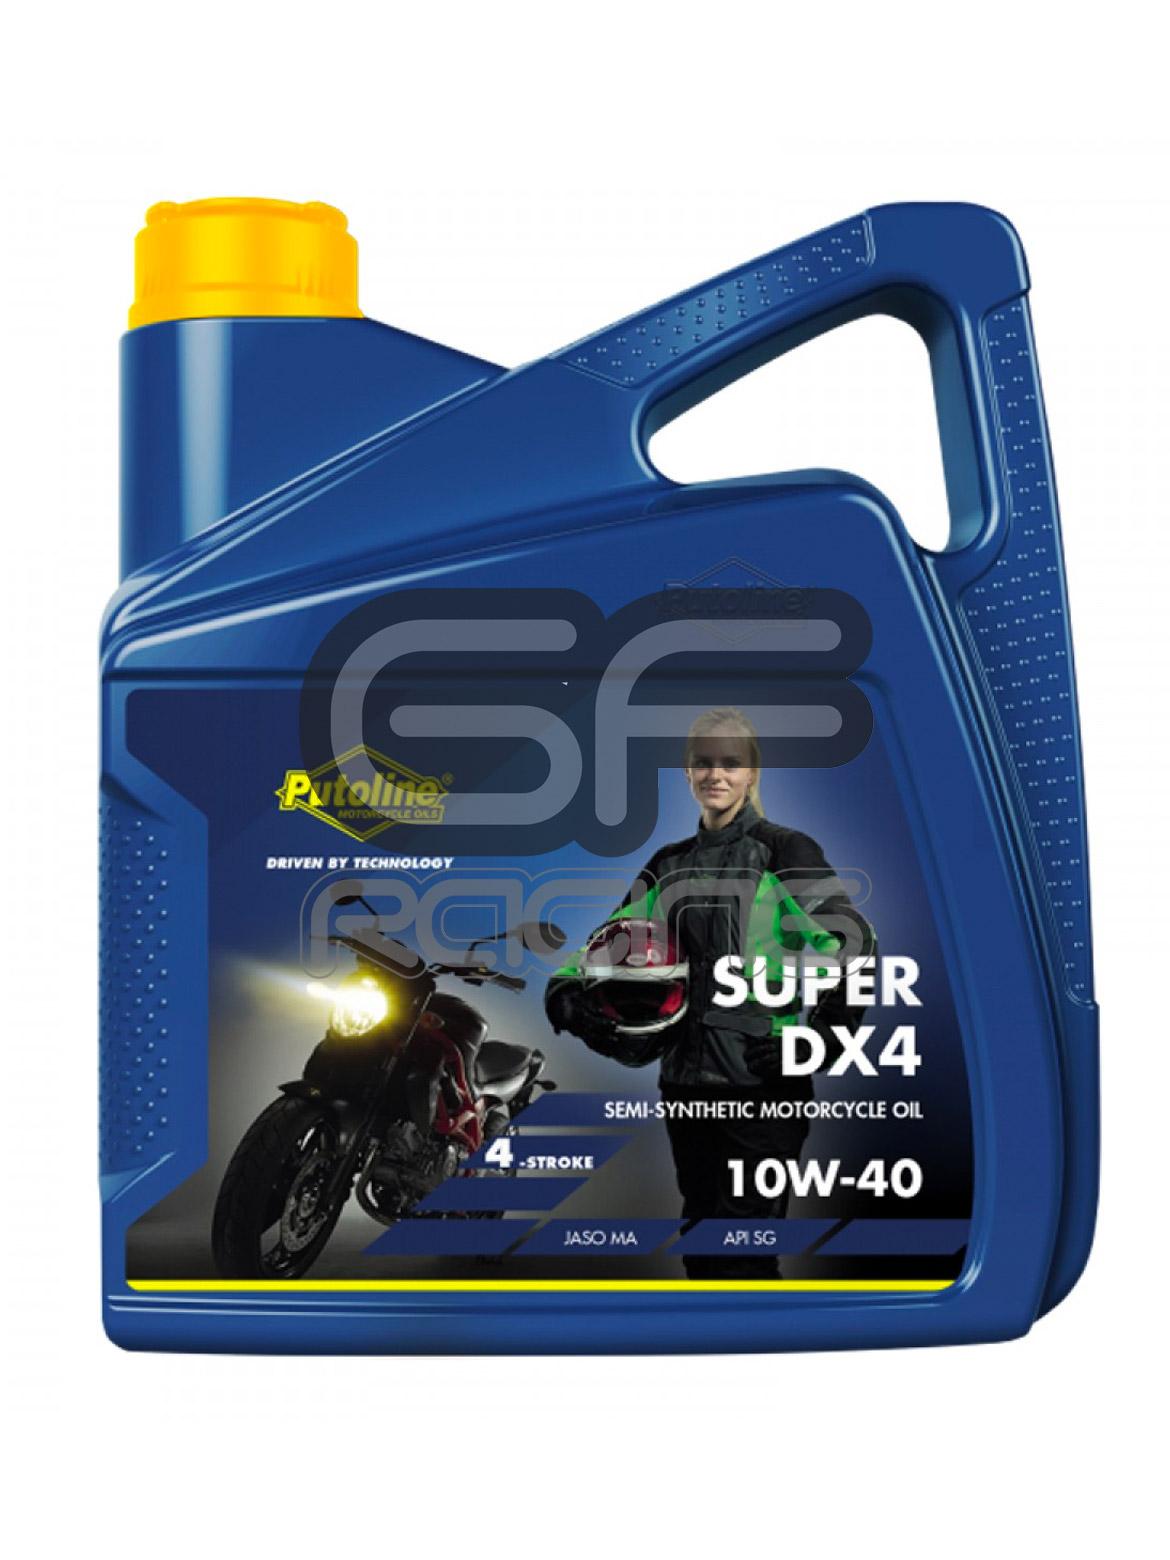 Putoline Oil DX4 Super 10W - 4 Litre